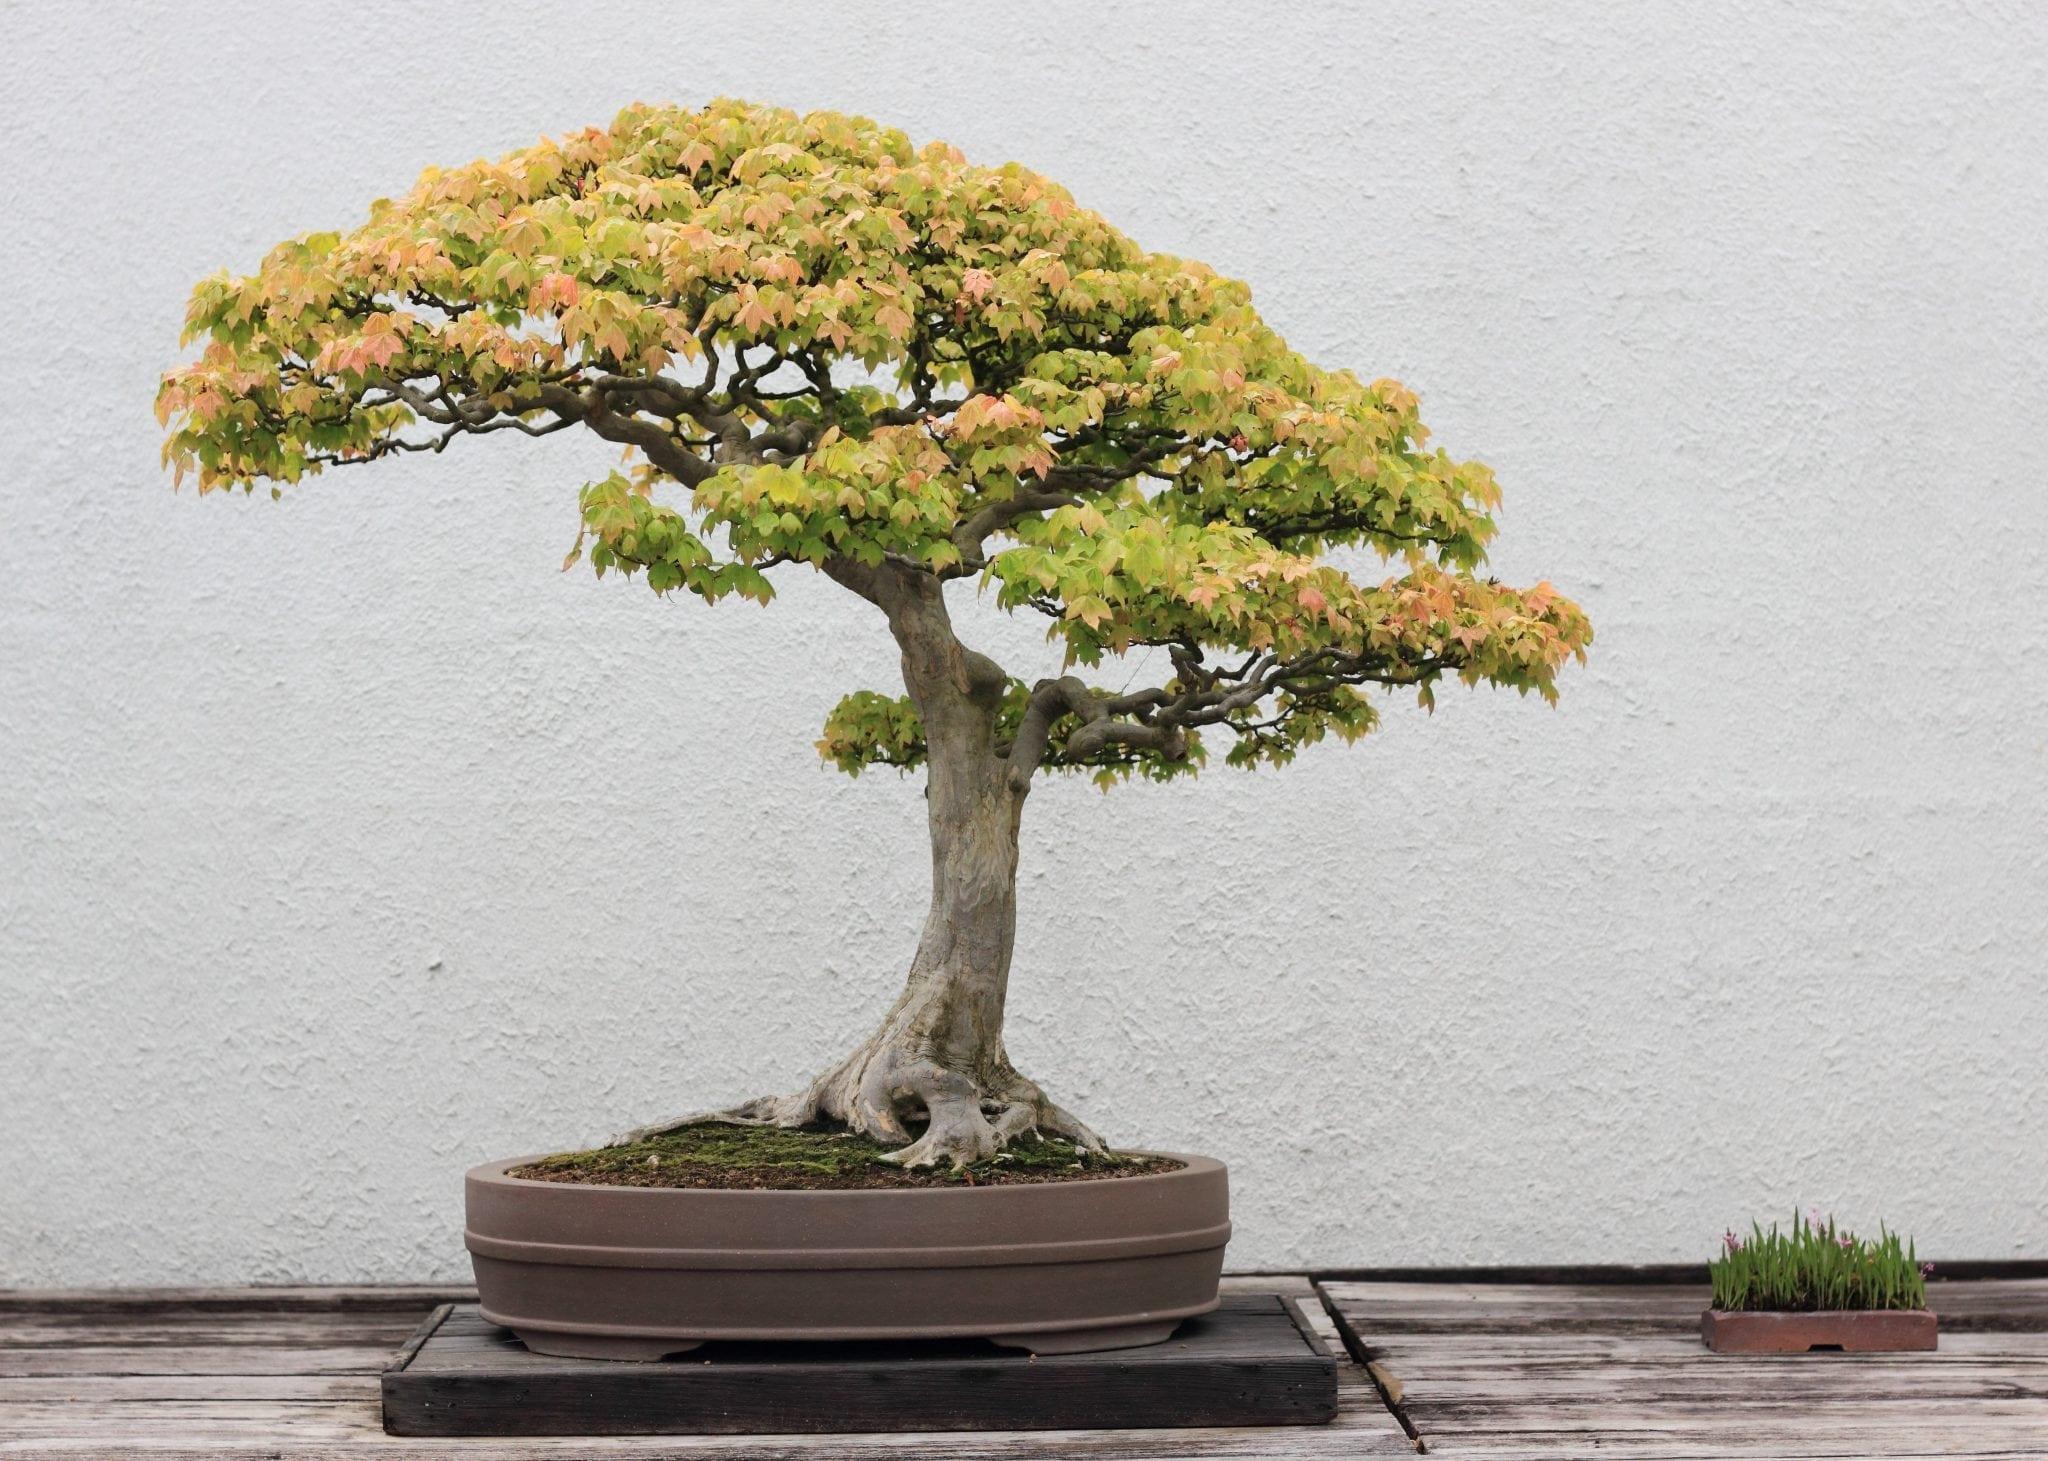 Remarkable Trident Maple Bonsai Tree Care Guide Acer Buergerianum Bonsai Wiring 101 Ferenstreekradiomeanderfmnl